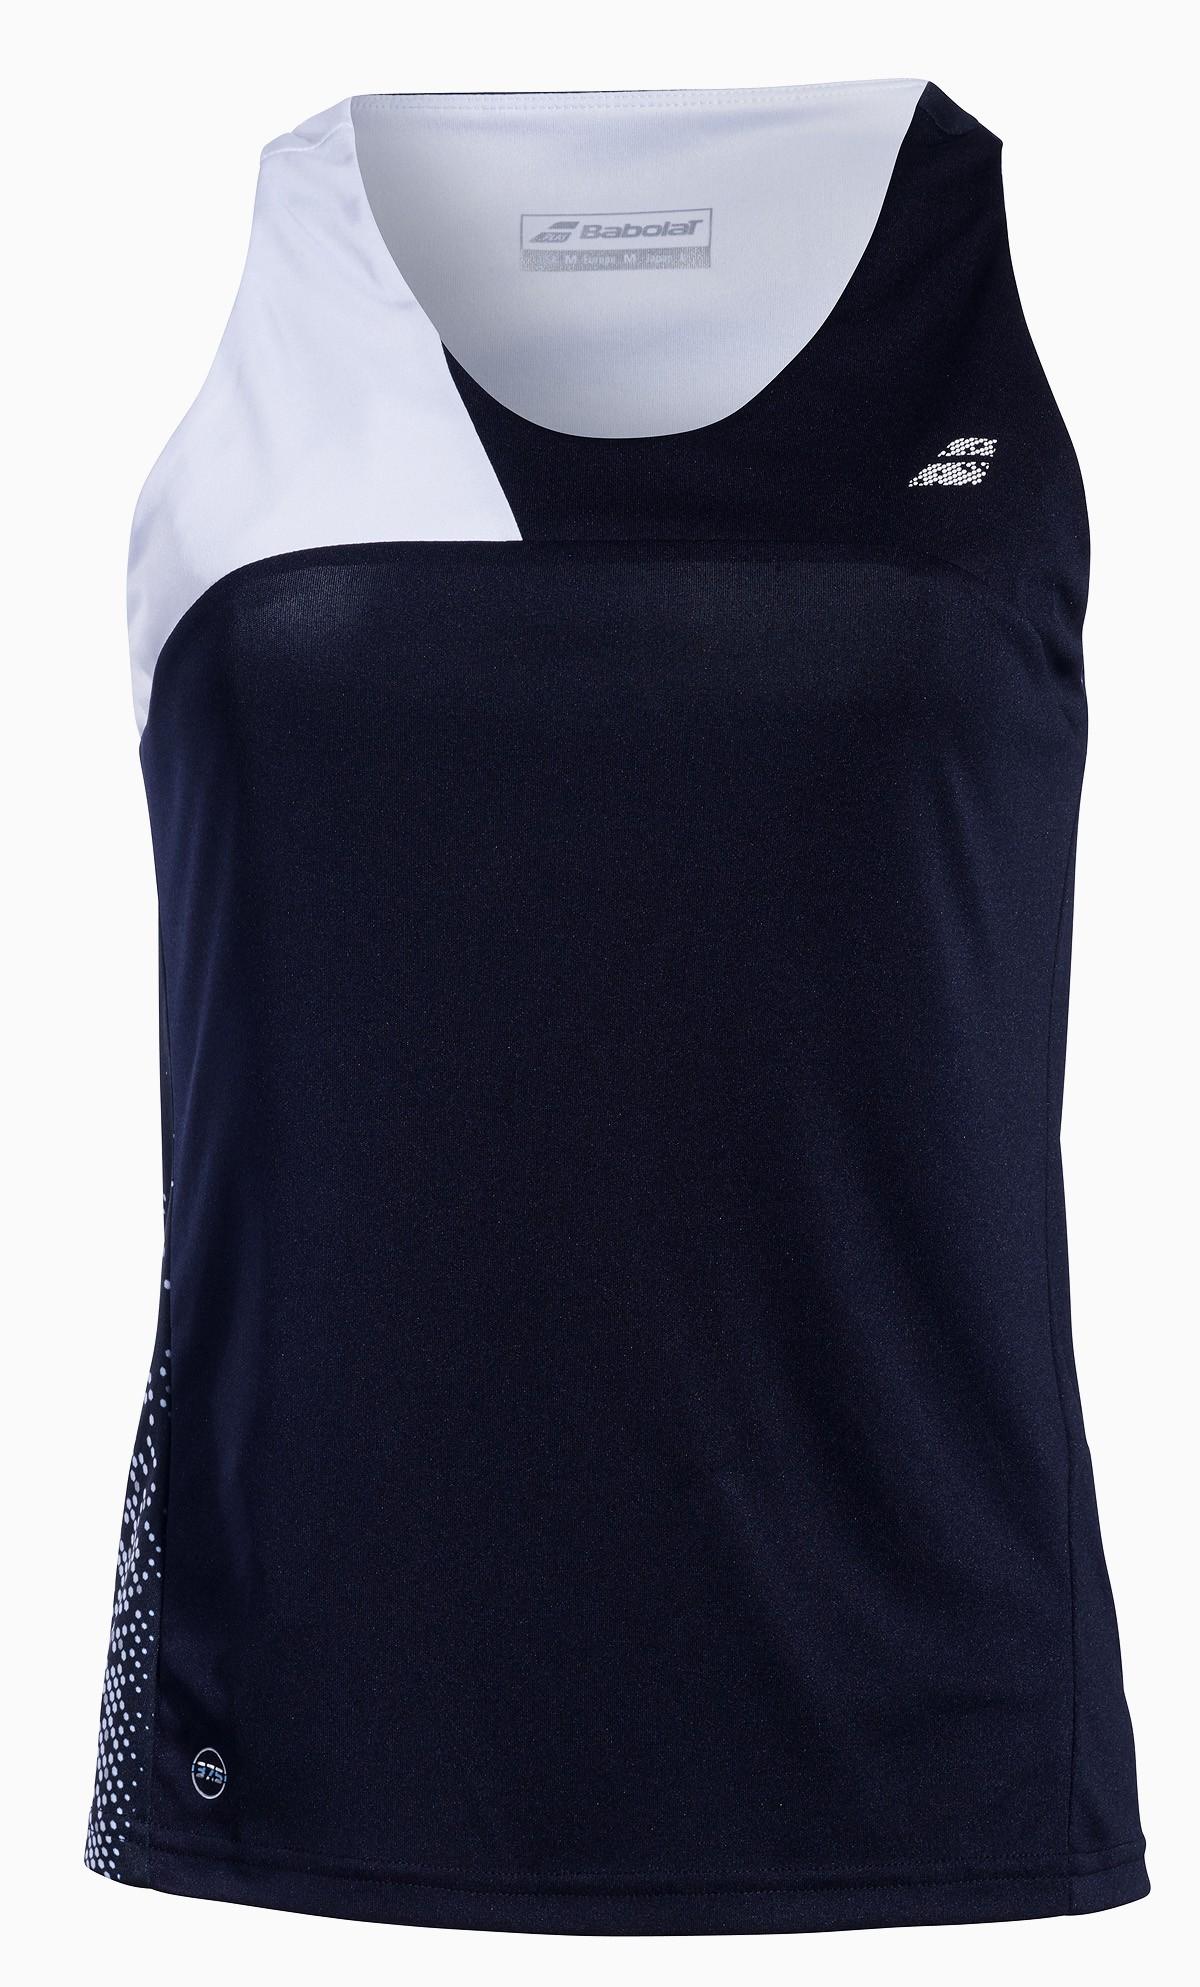 Koszulka tenisowa damska Babolat PERF Tank Top Black - 50%